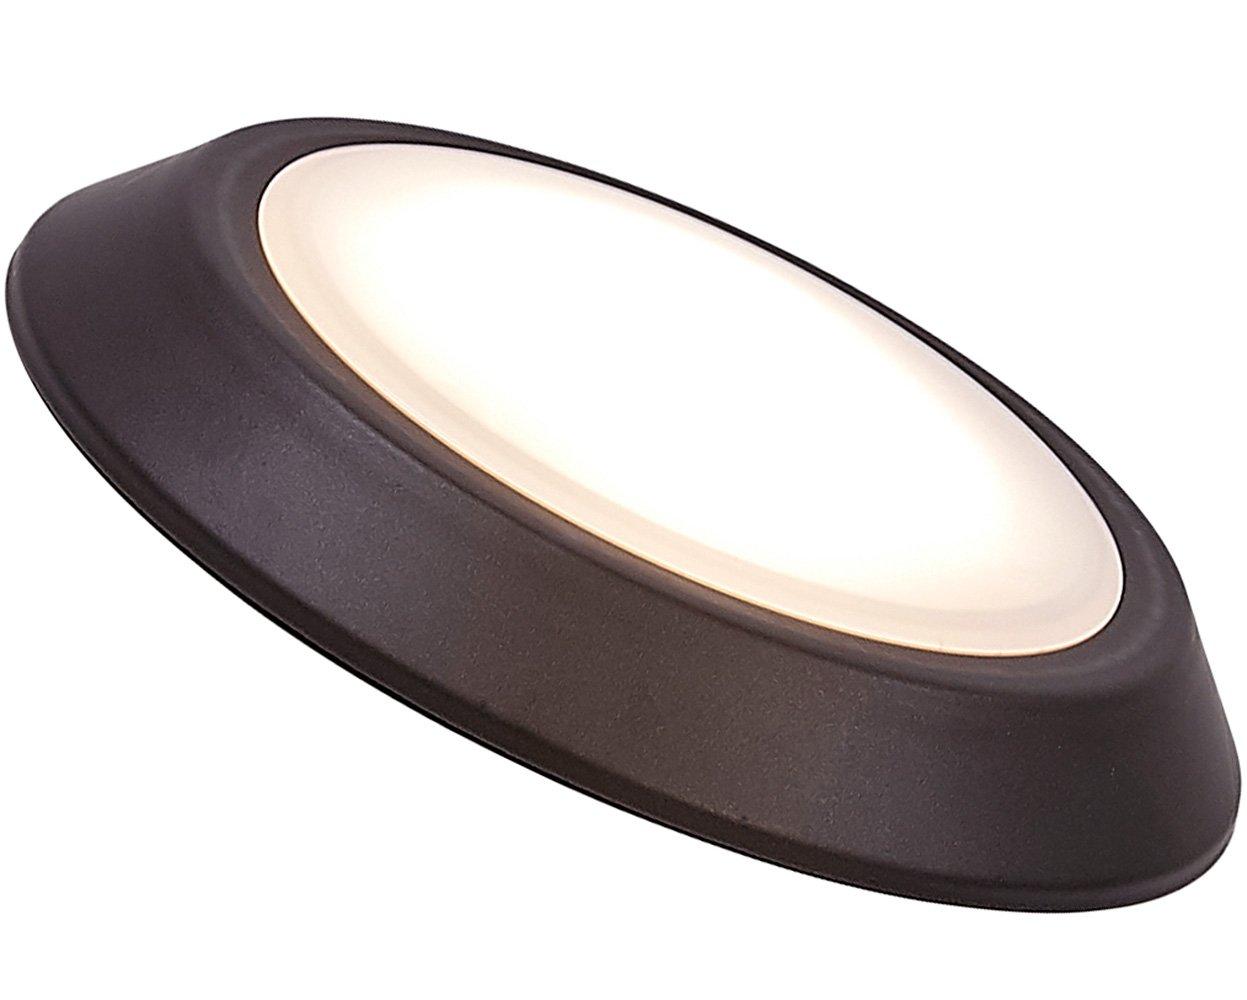 New Round Flush Mount Thin Ceiling Light